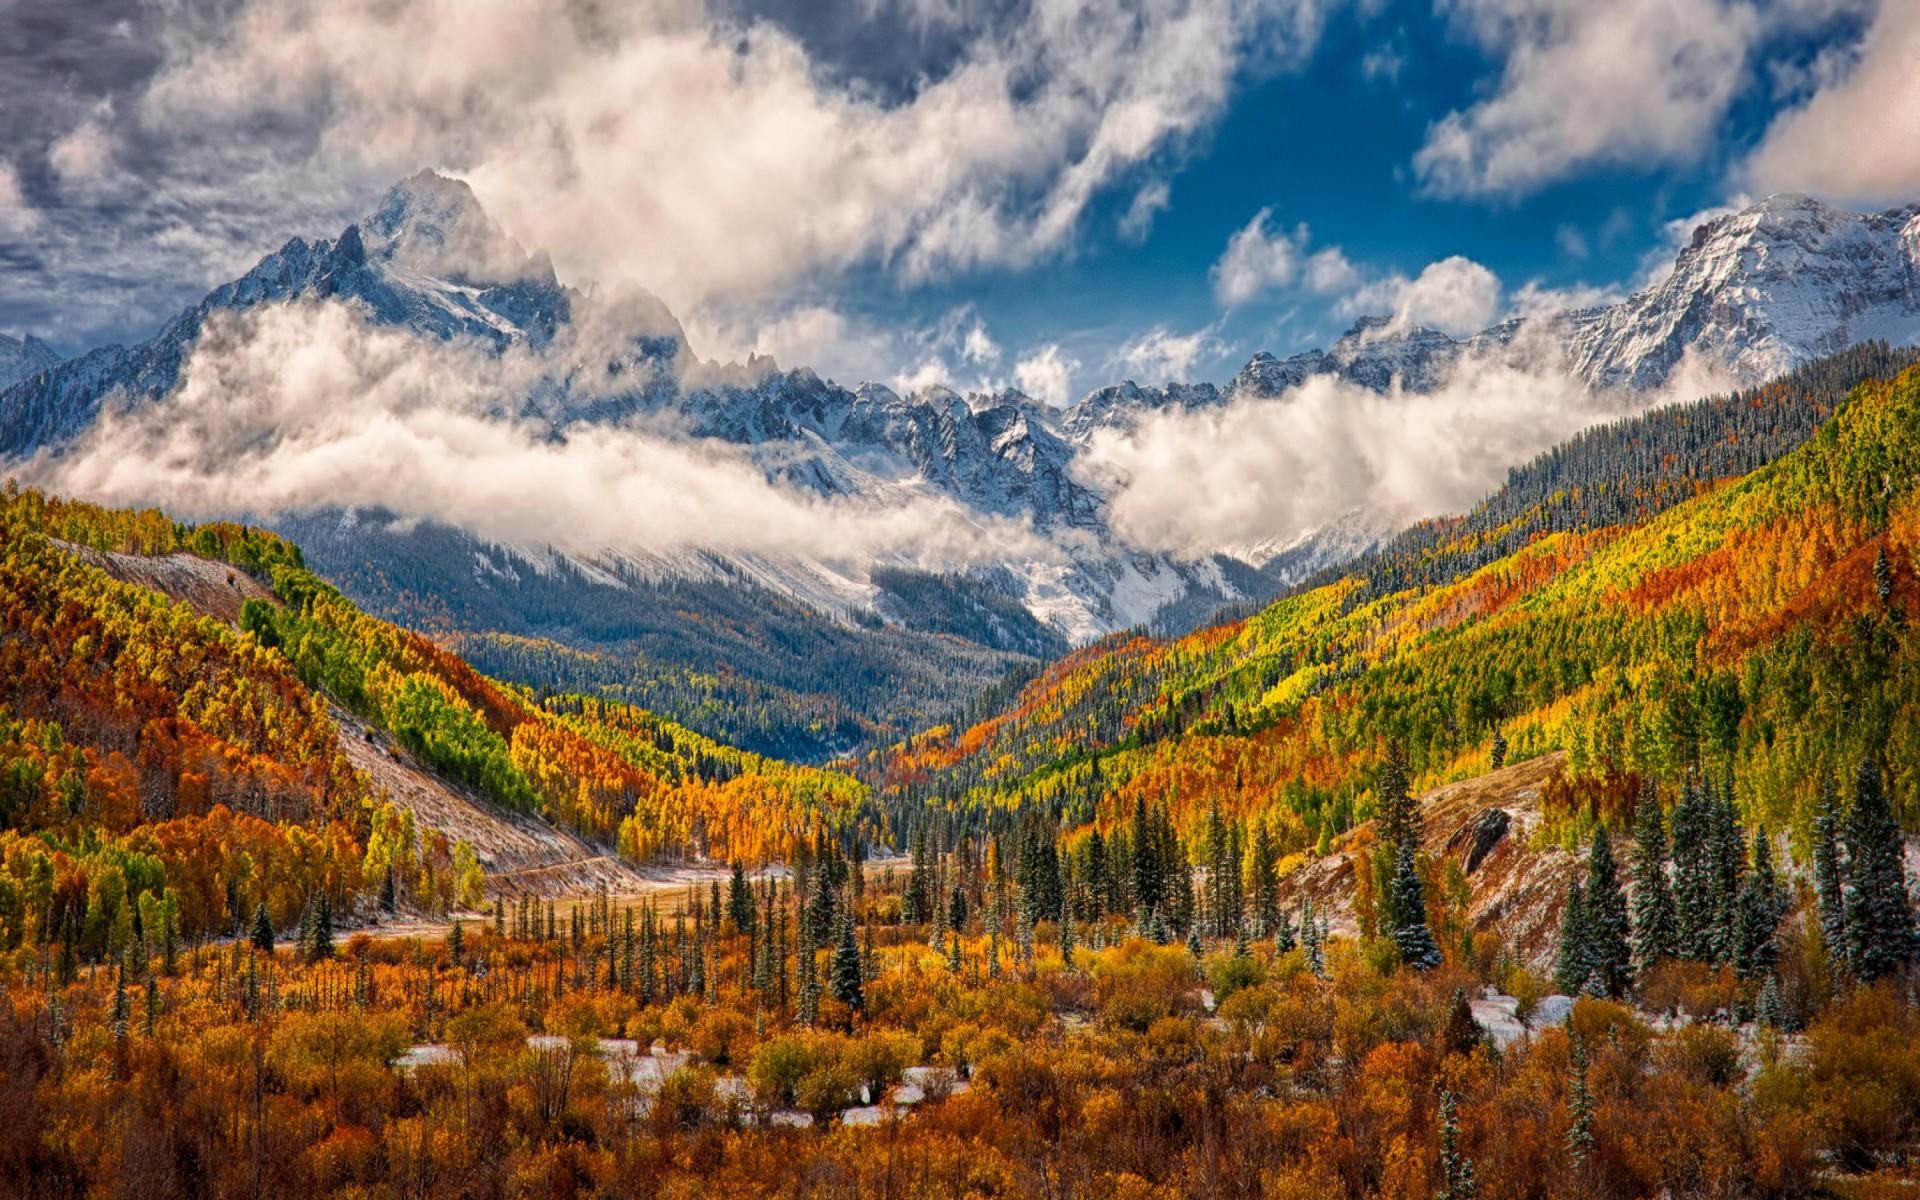 Fall Foliage Wallpaper Widescreen Autumn Mountain Landscape Hd Wallpaper Background Image